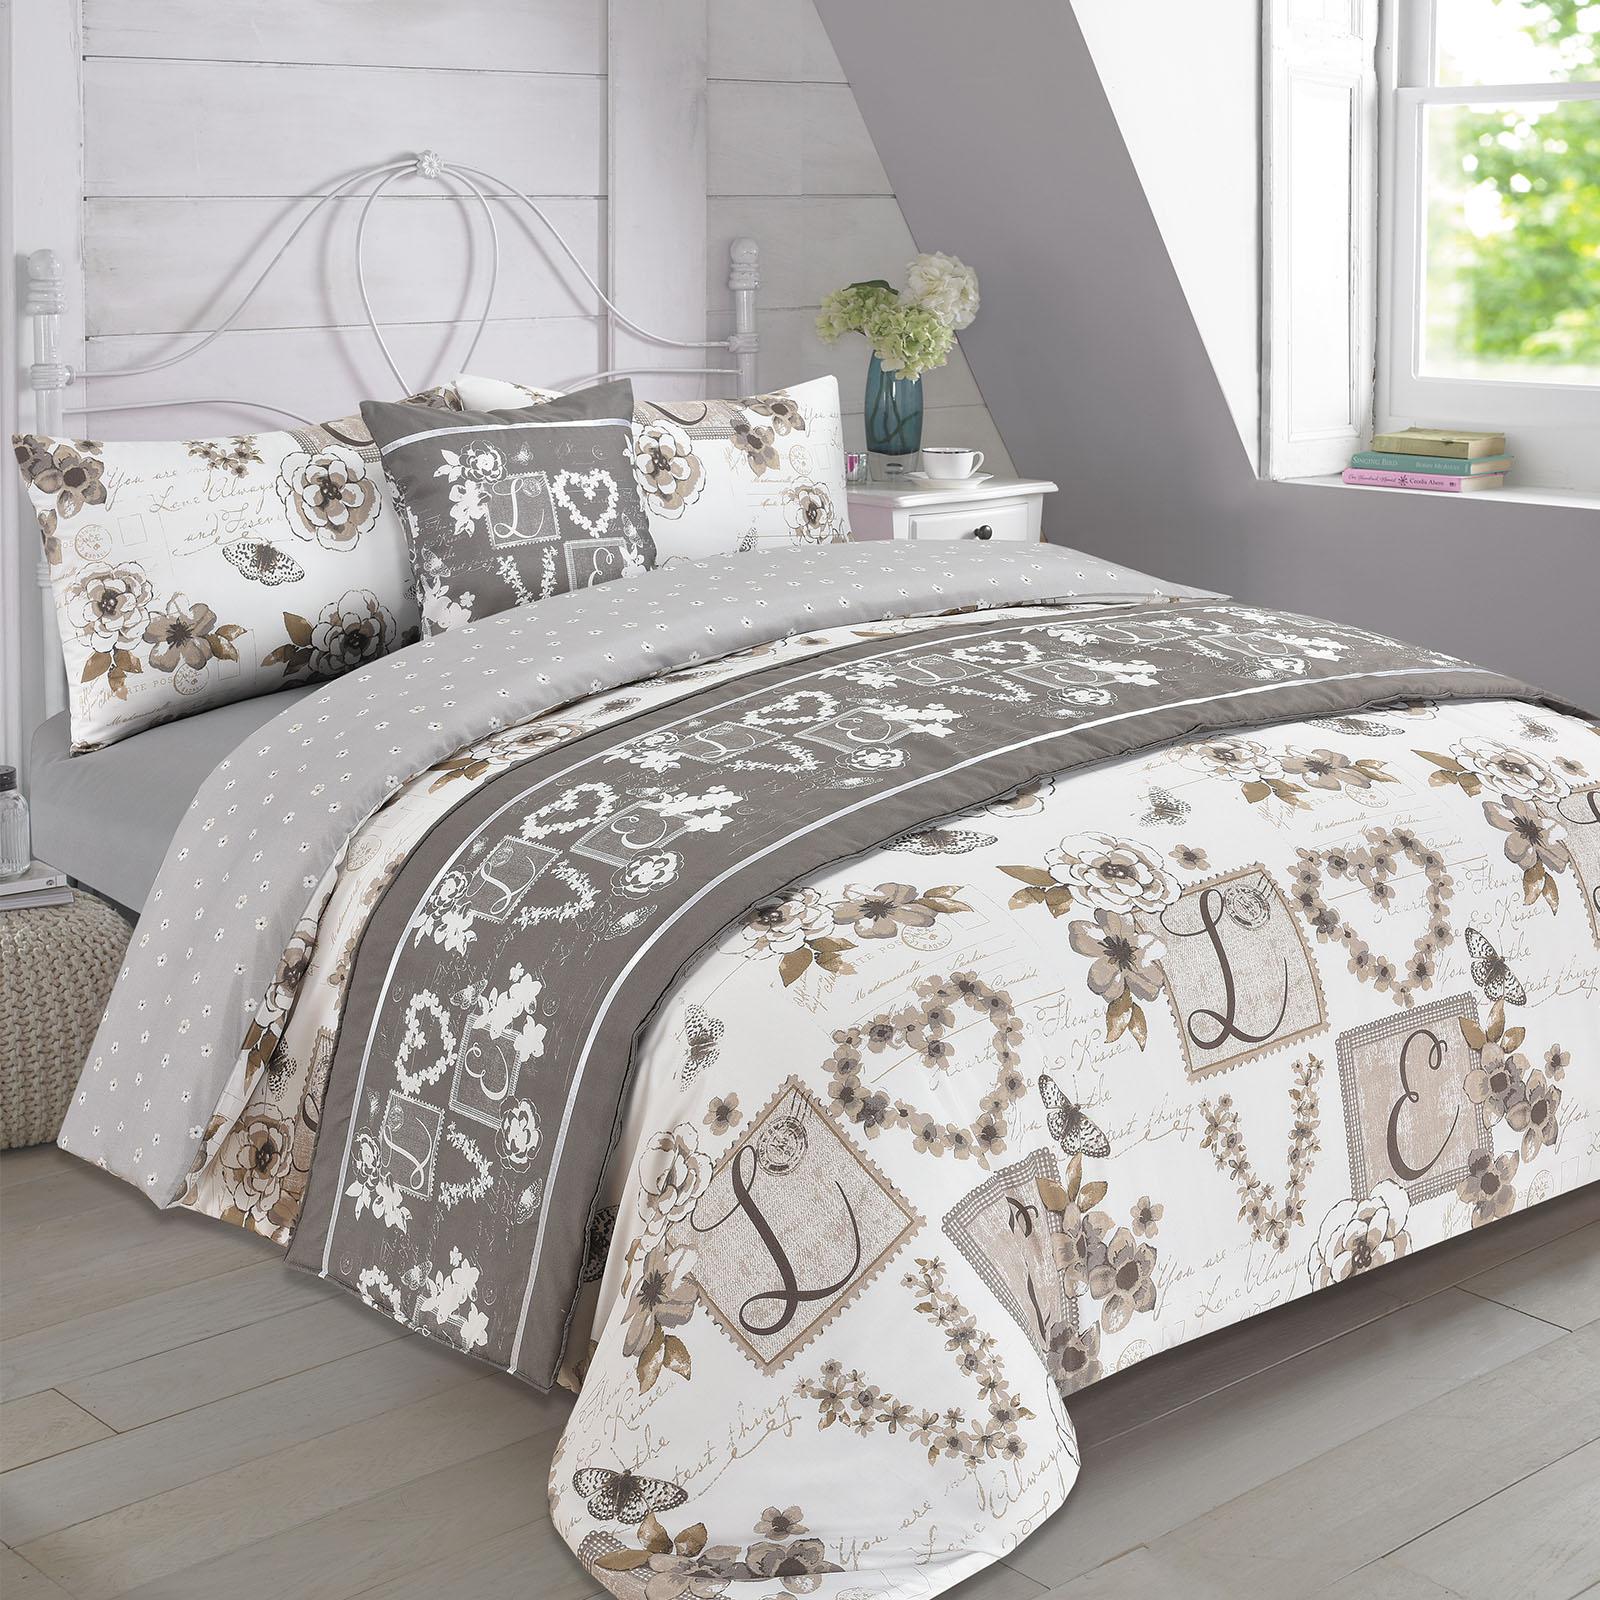 complete bedding set duvet cover with pillowcase sheet - Vintage Bedding